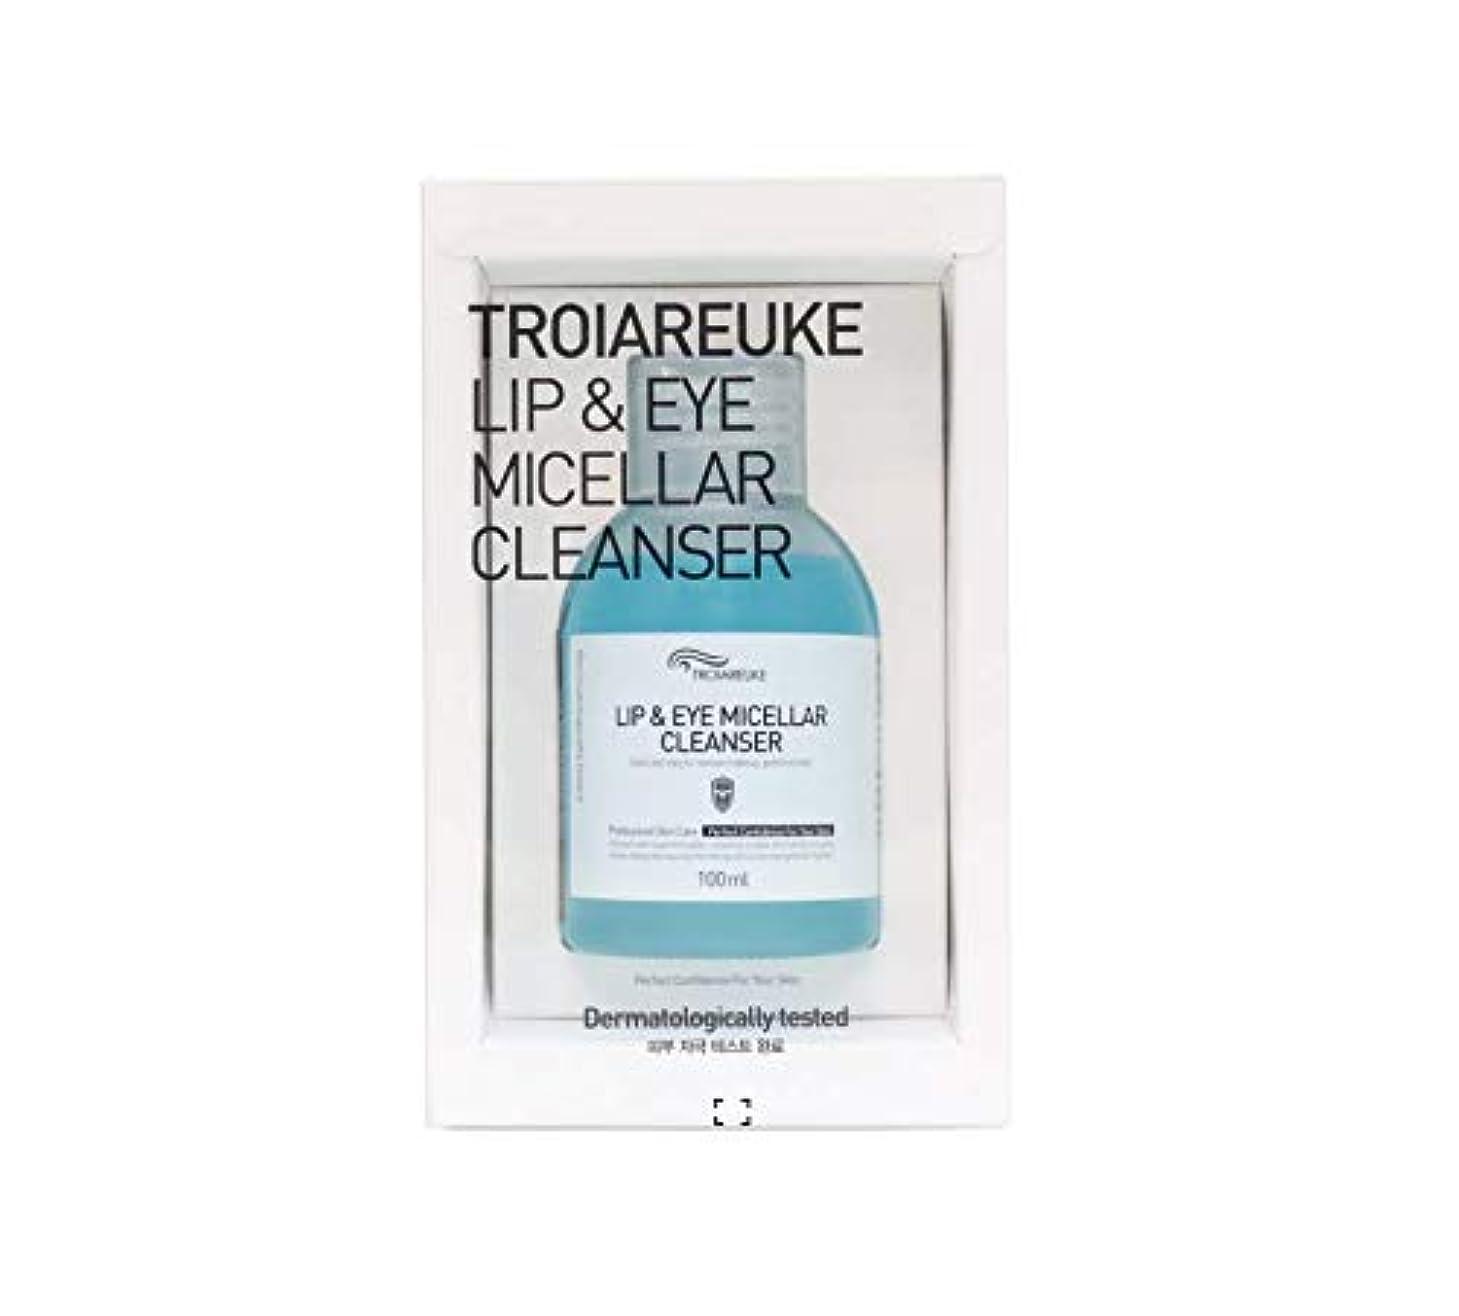 TROIAREUKE (トロイアルケ) リップ & アイ ミセラー クレンザー / Lip & Eye Micellar Cleanser (100ml) [並行輸入品]